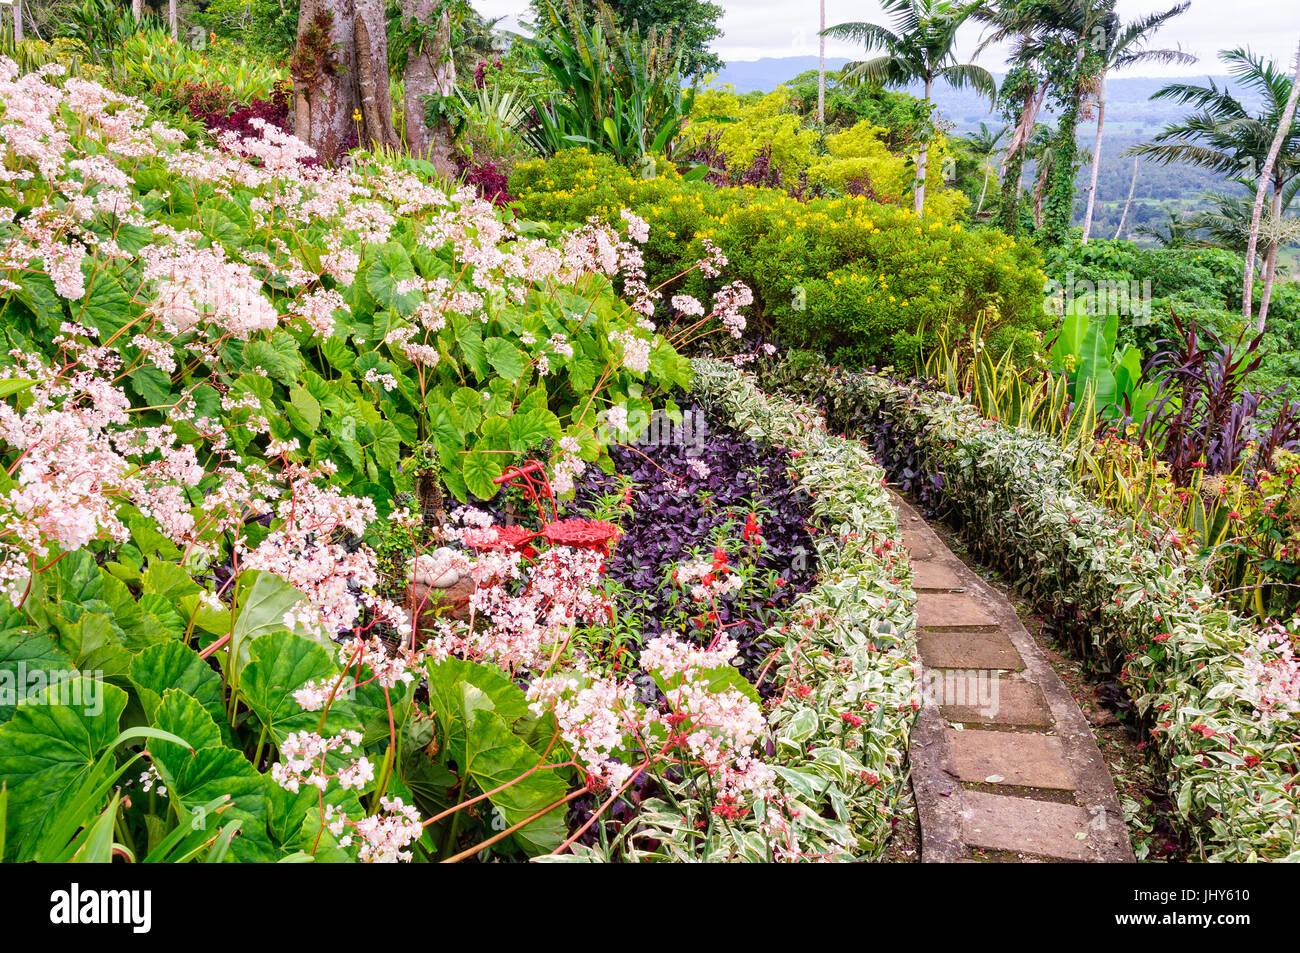 Little path between the flower beds in The Summit Gardens - Port Vila, Efate Island, Vanuatu - Stock Image